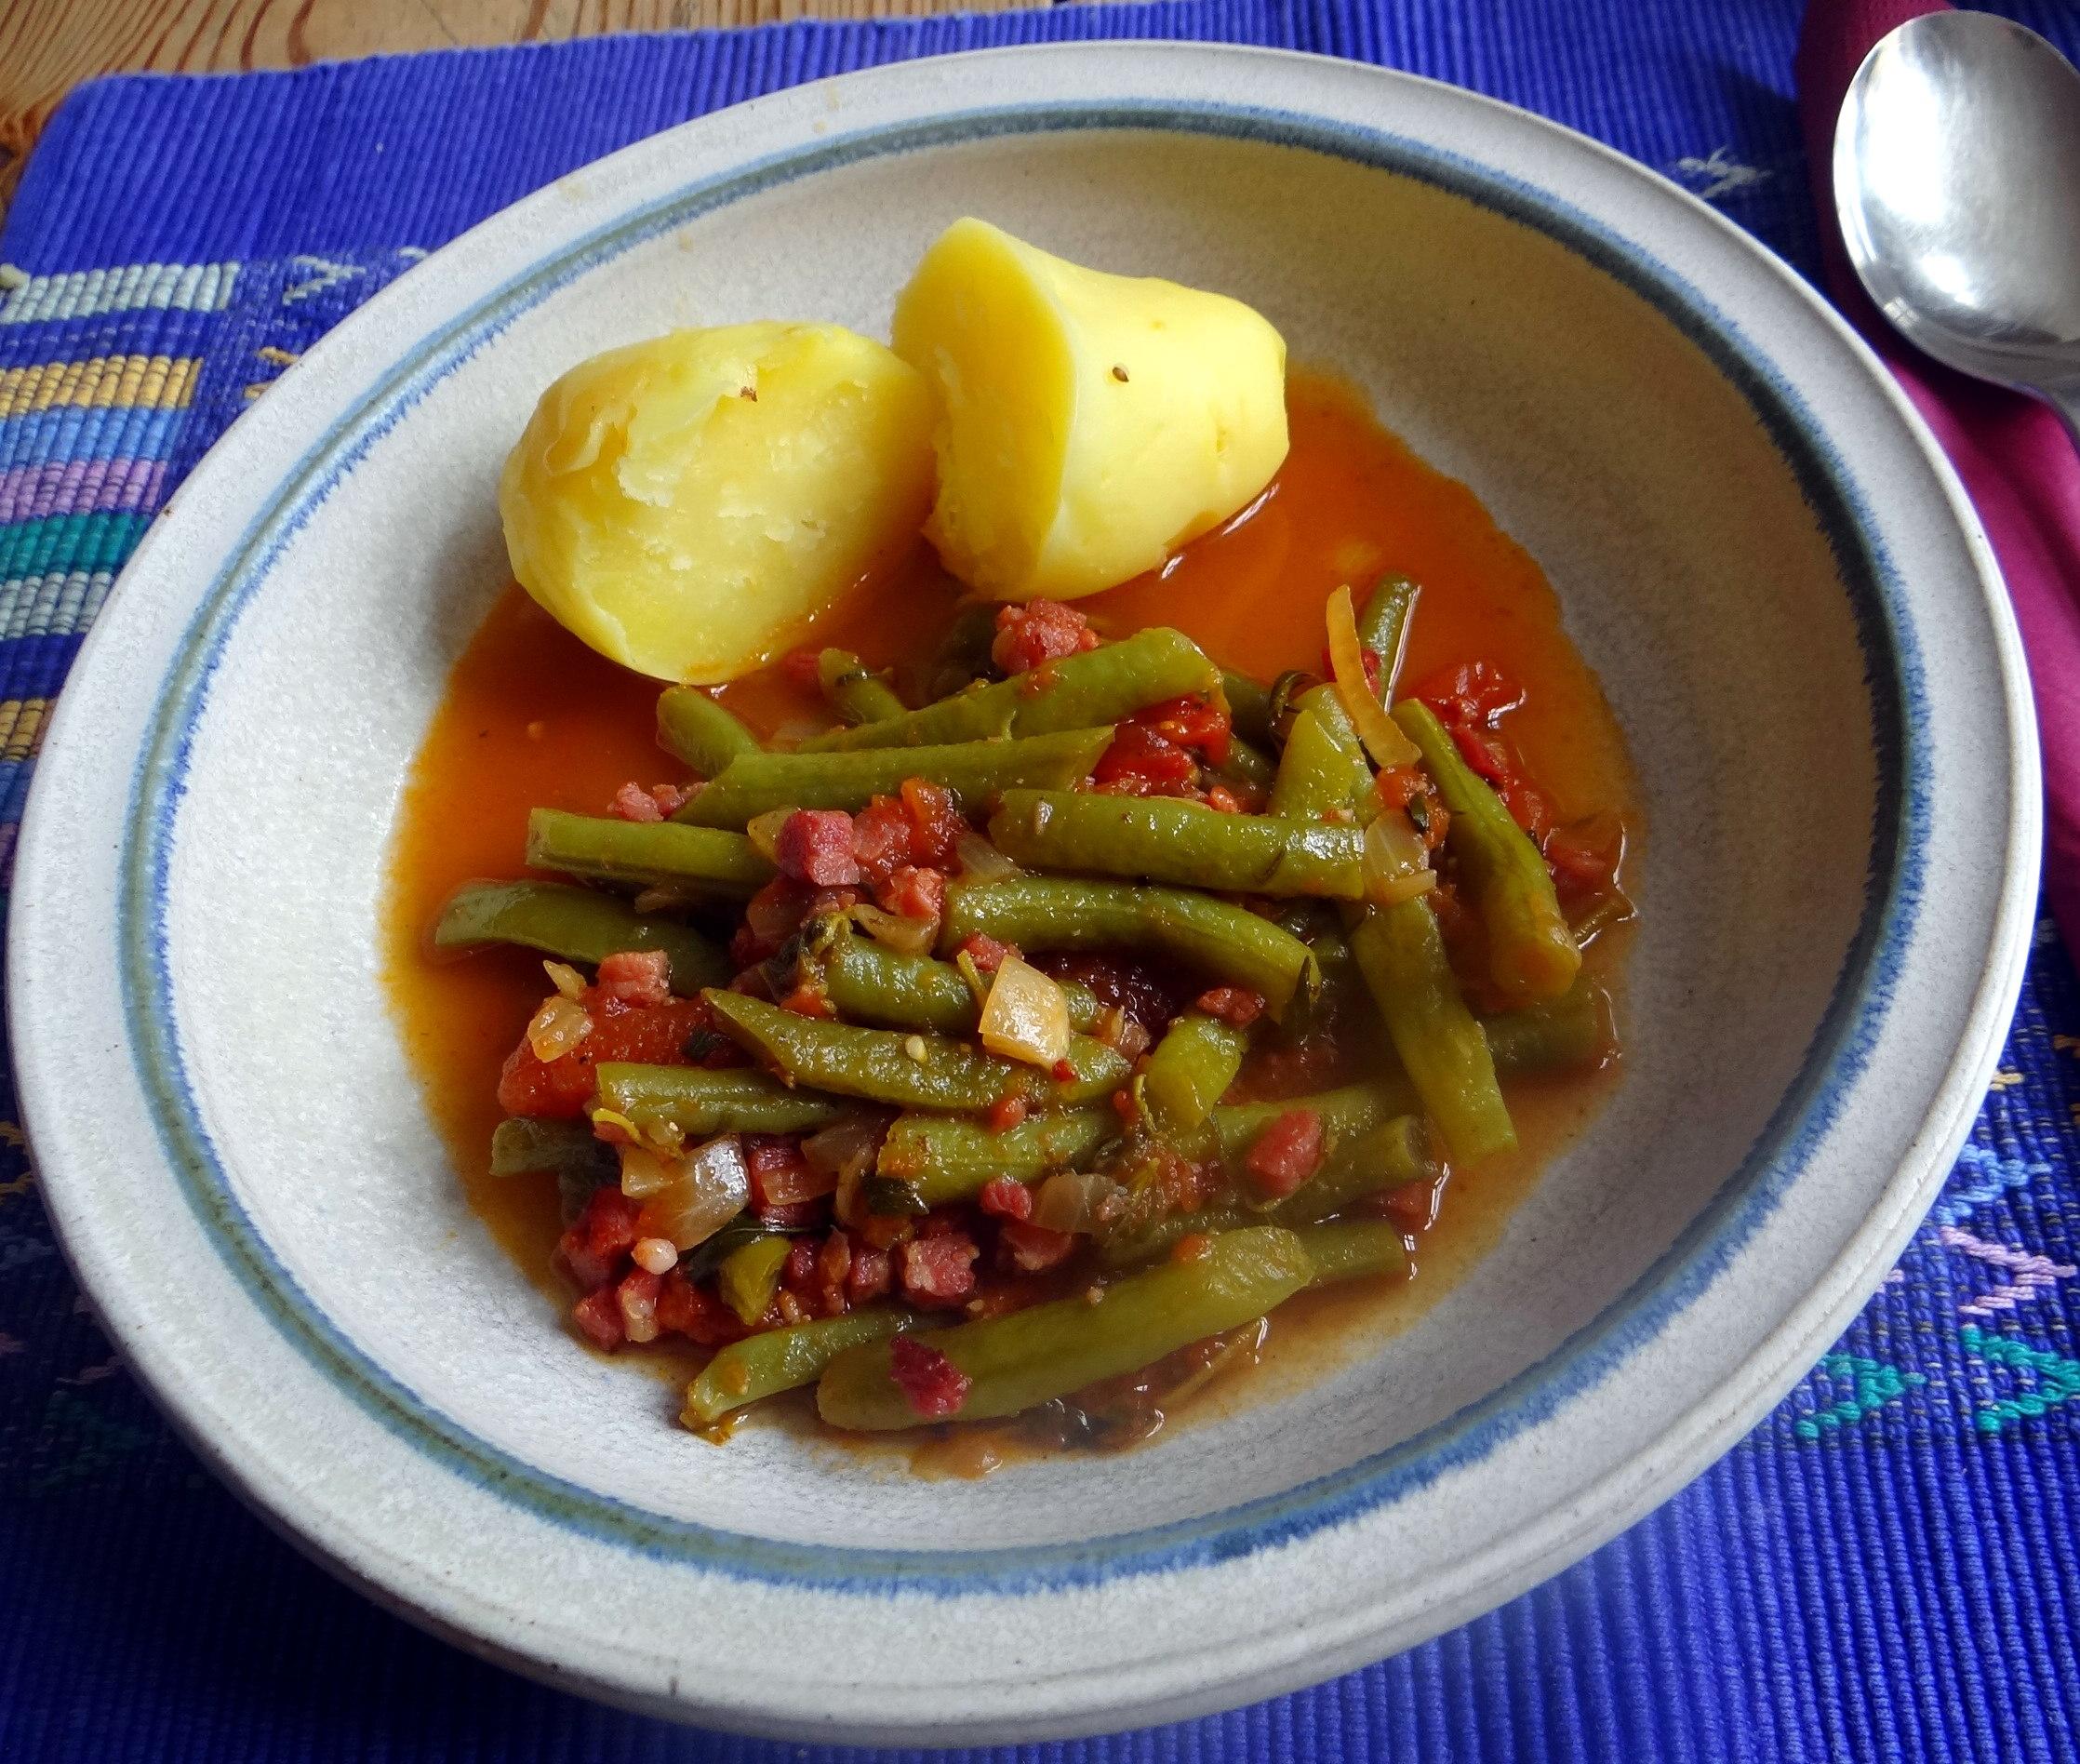 Bohnengemüse,Pellkartoffeln,Obstsalat (2)